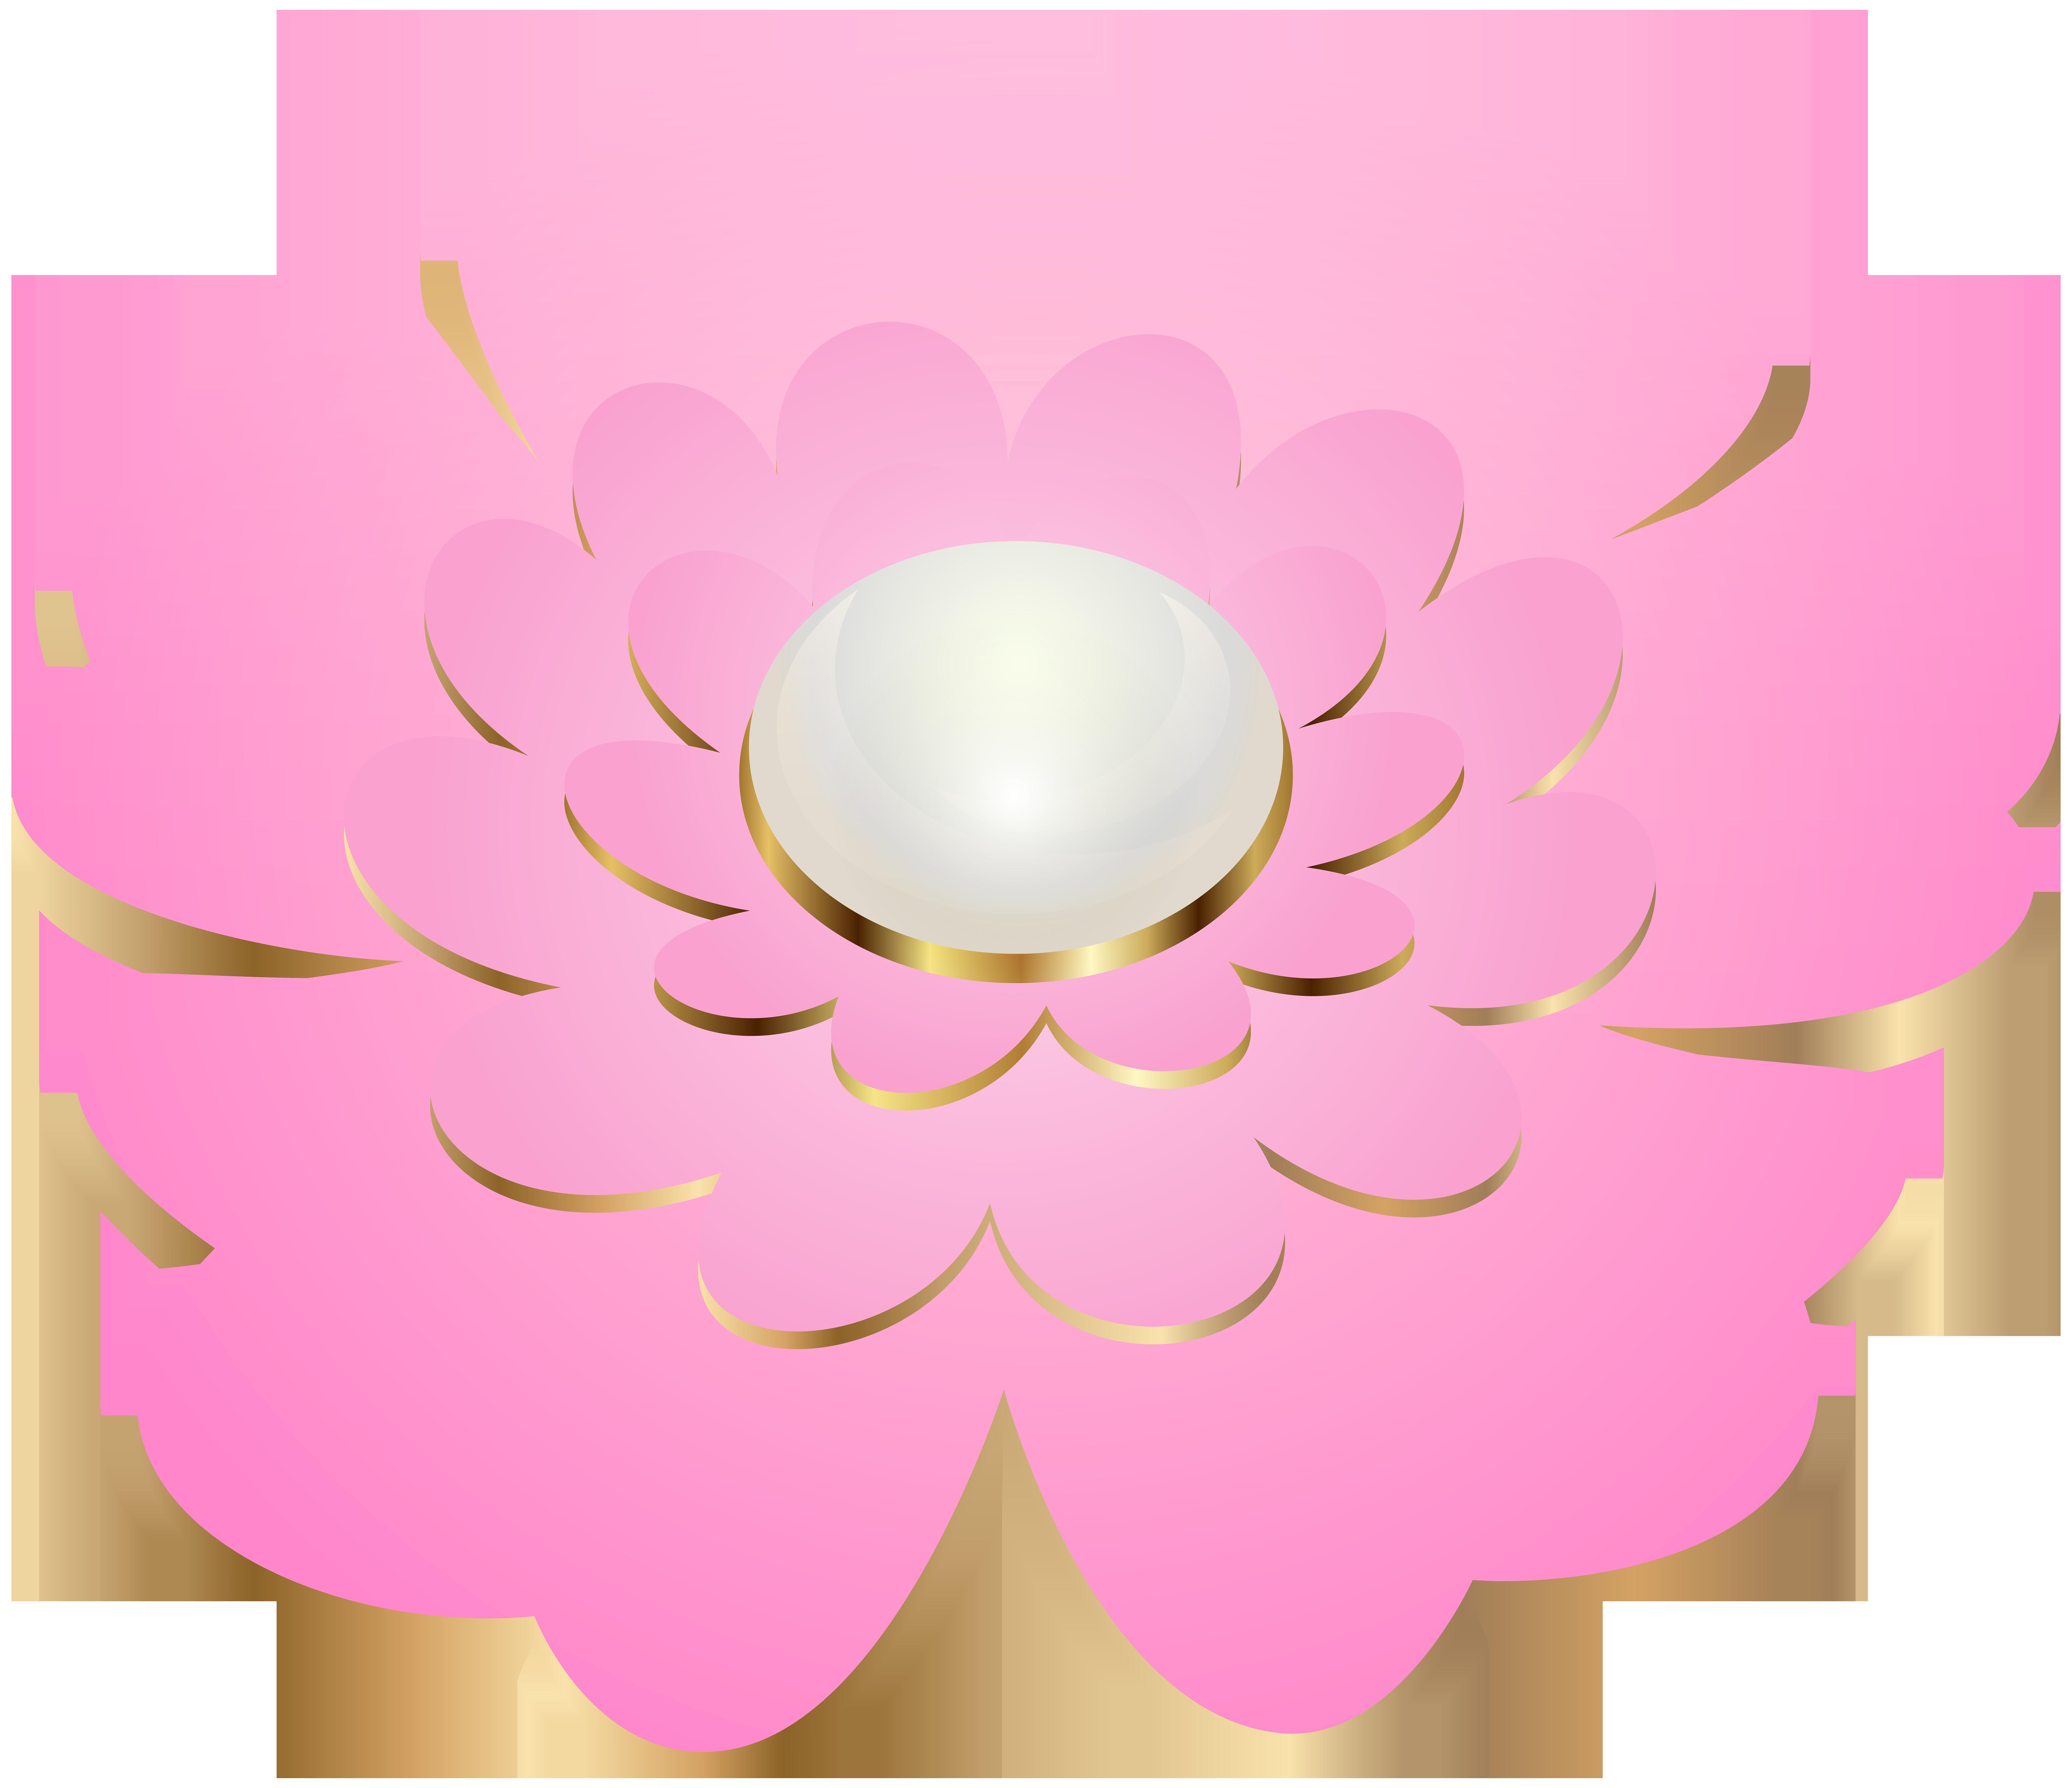 8000x6903 Pink Decorative Flower Transparent Clip Artu200b Gallery